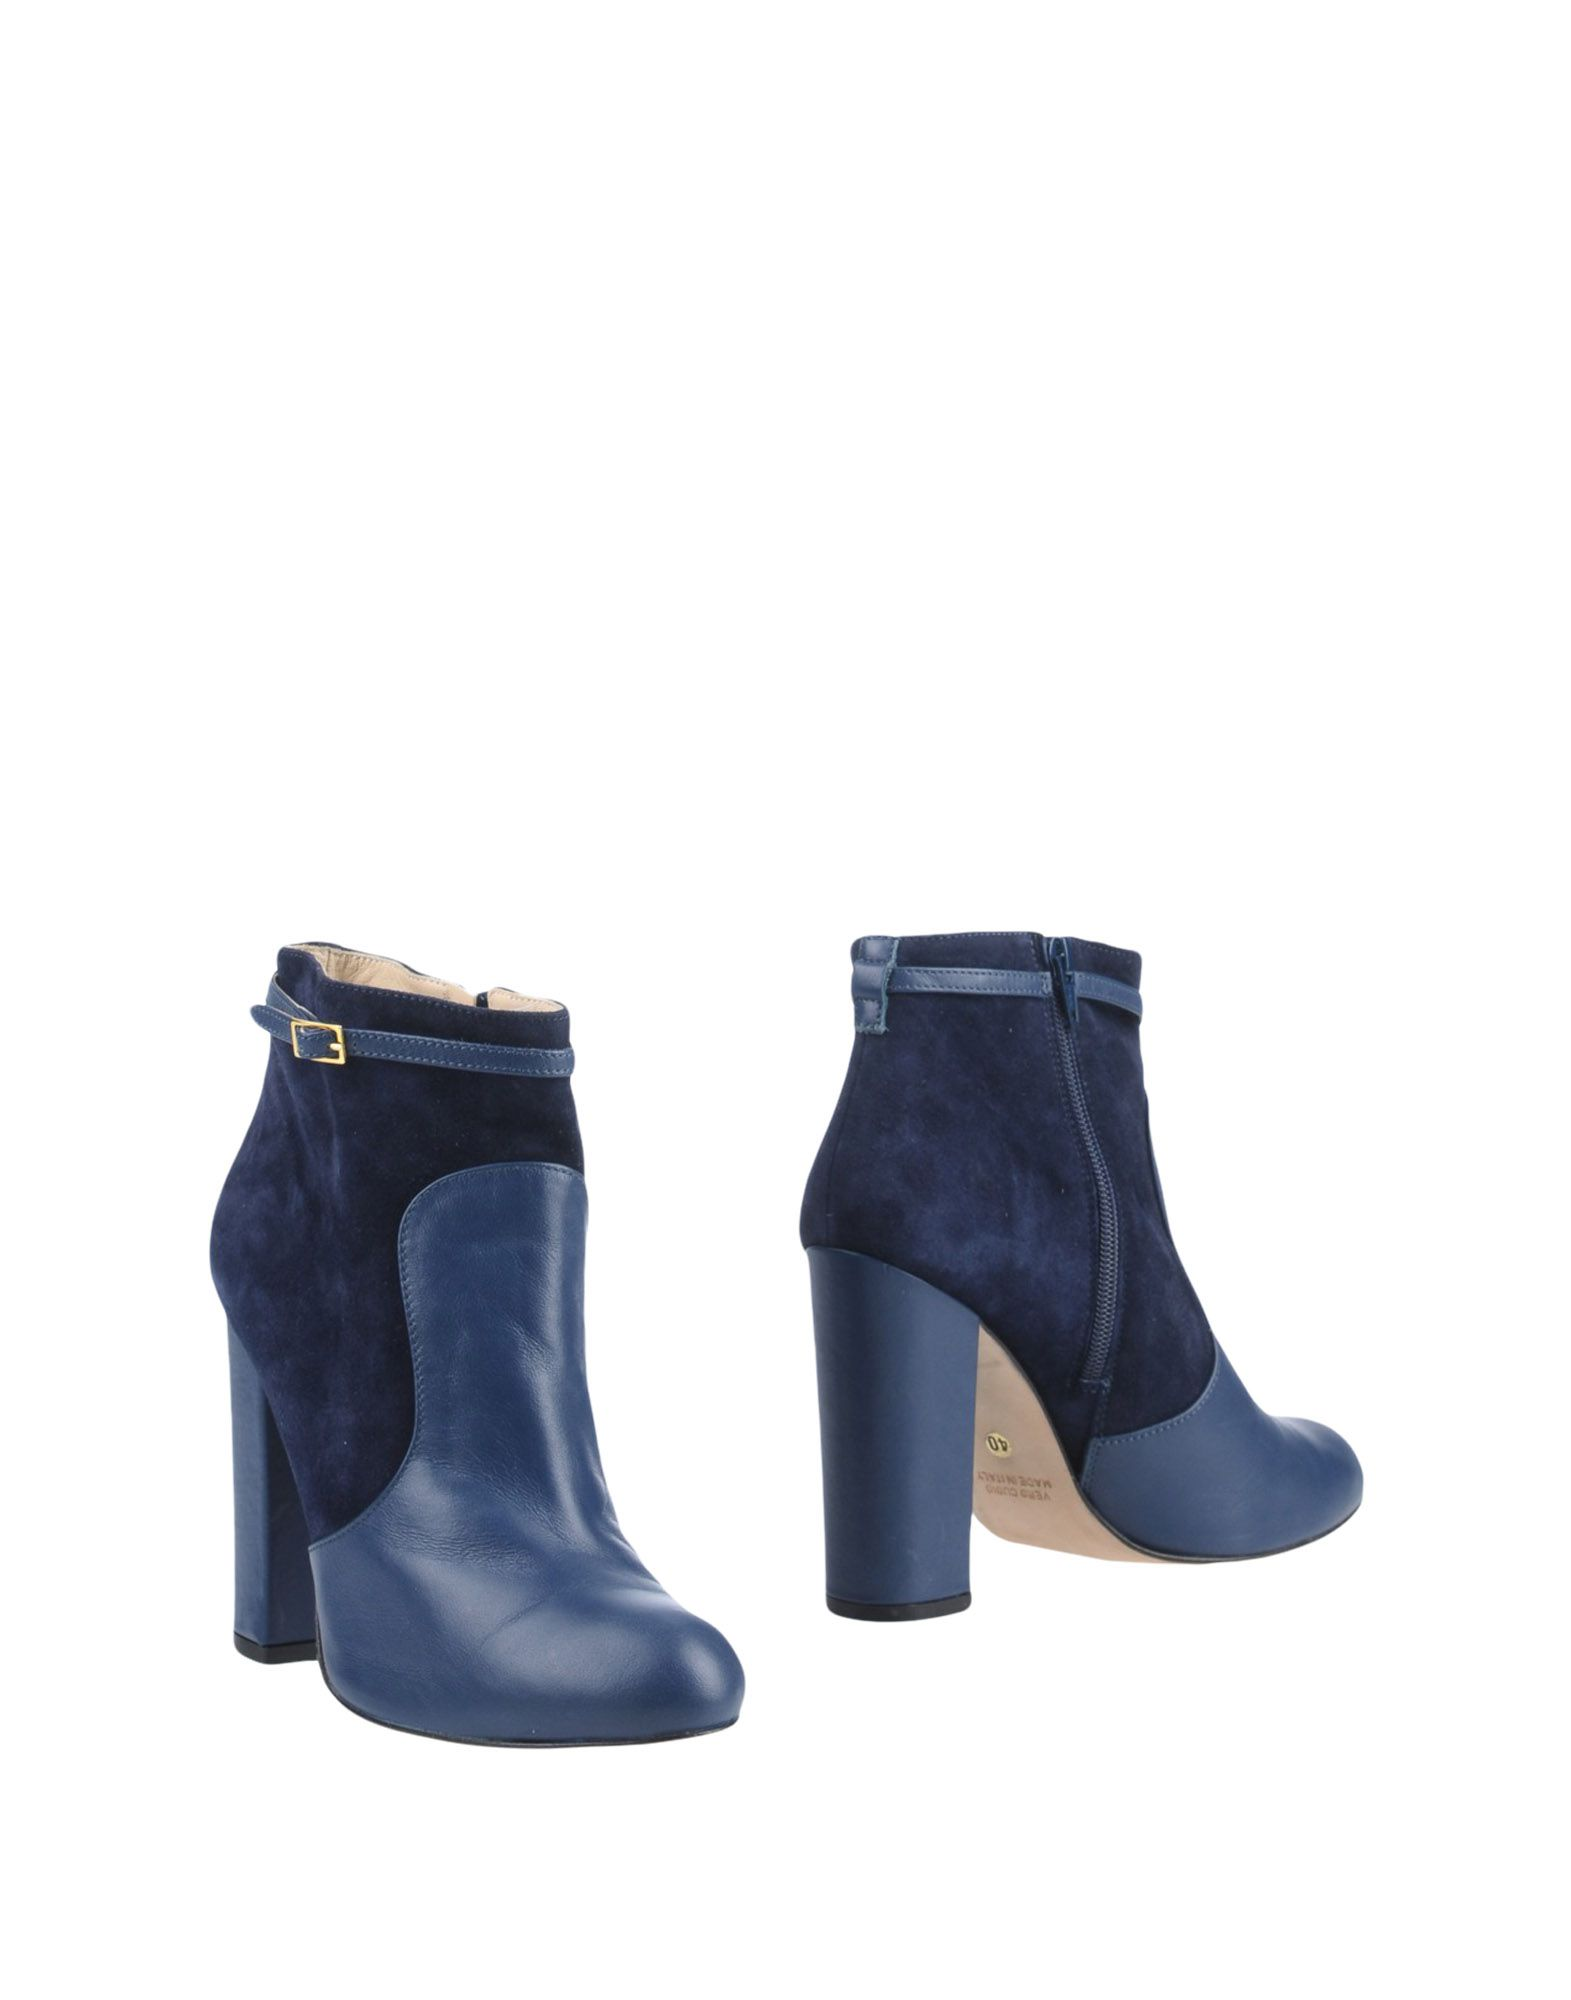 Blugirl Blugirl Blugirl Blumarine Stiefelette Damen  11315868EN Beliebte Schuhe 9039c9